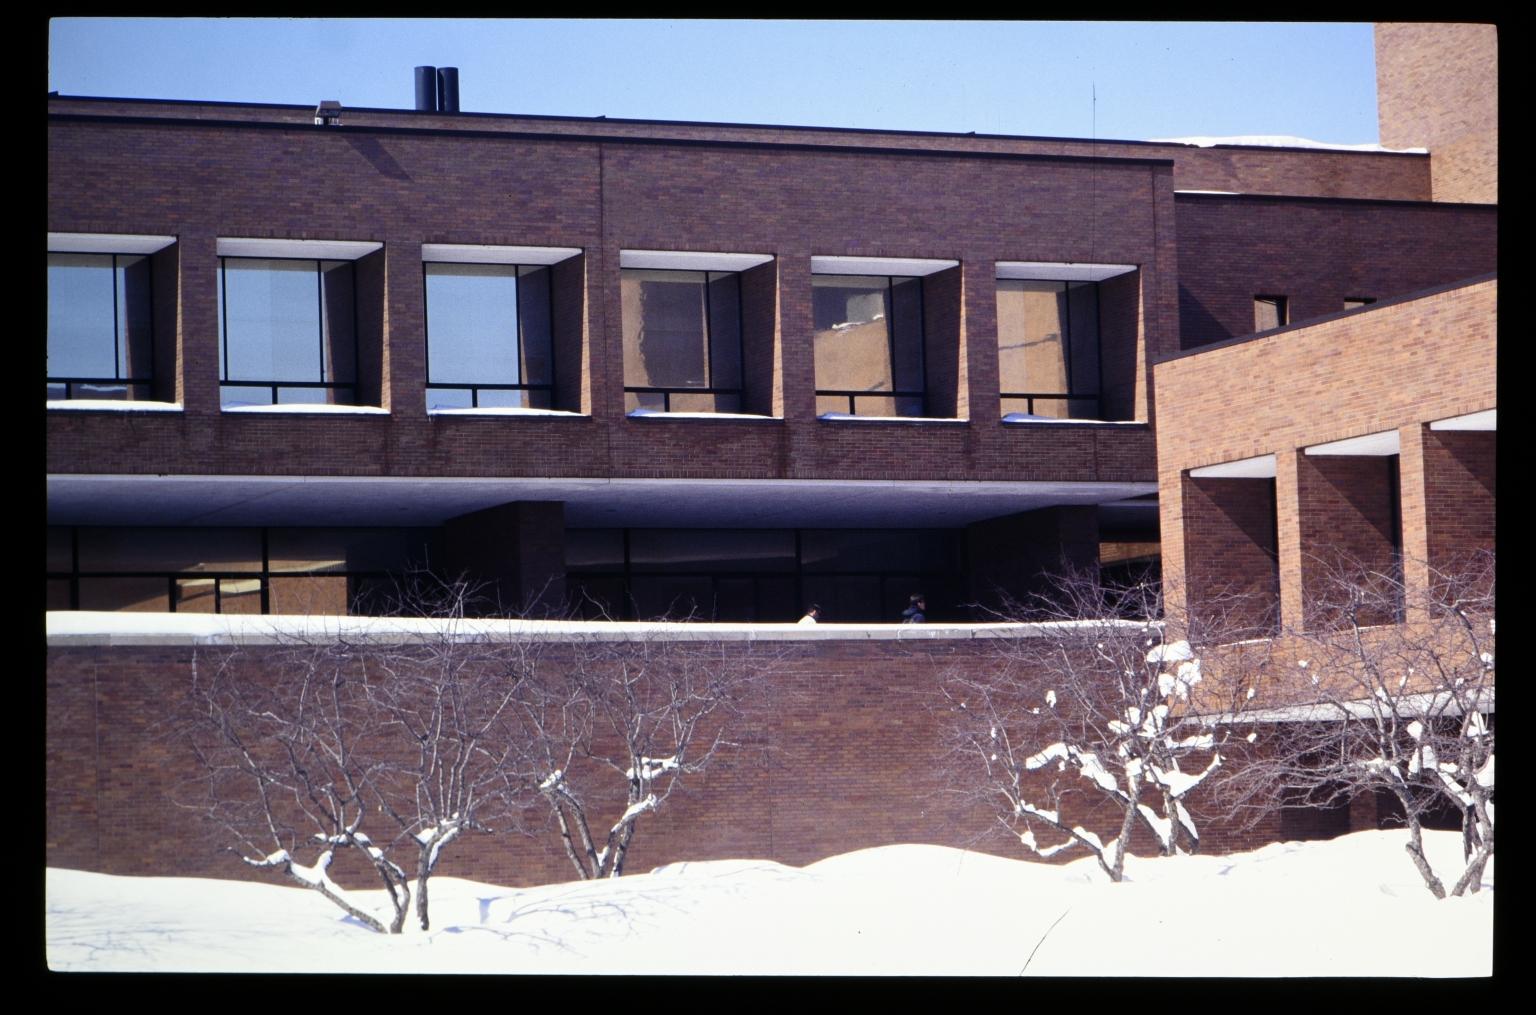 Winter on campus